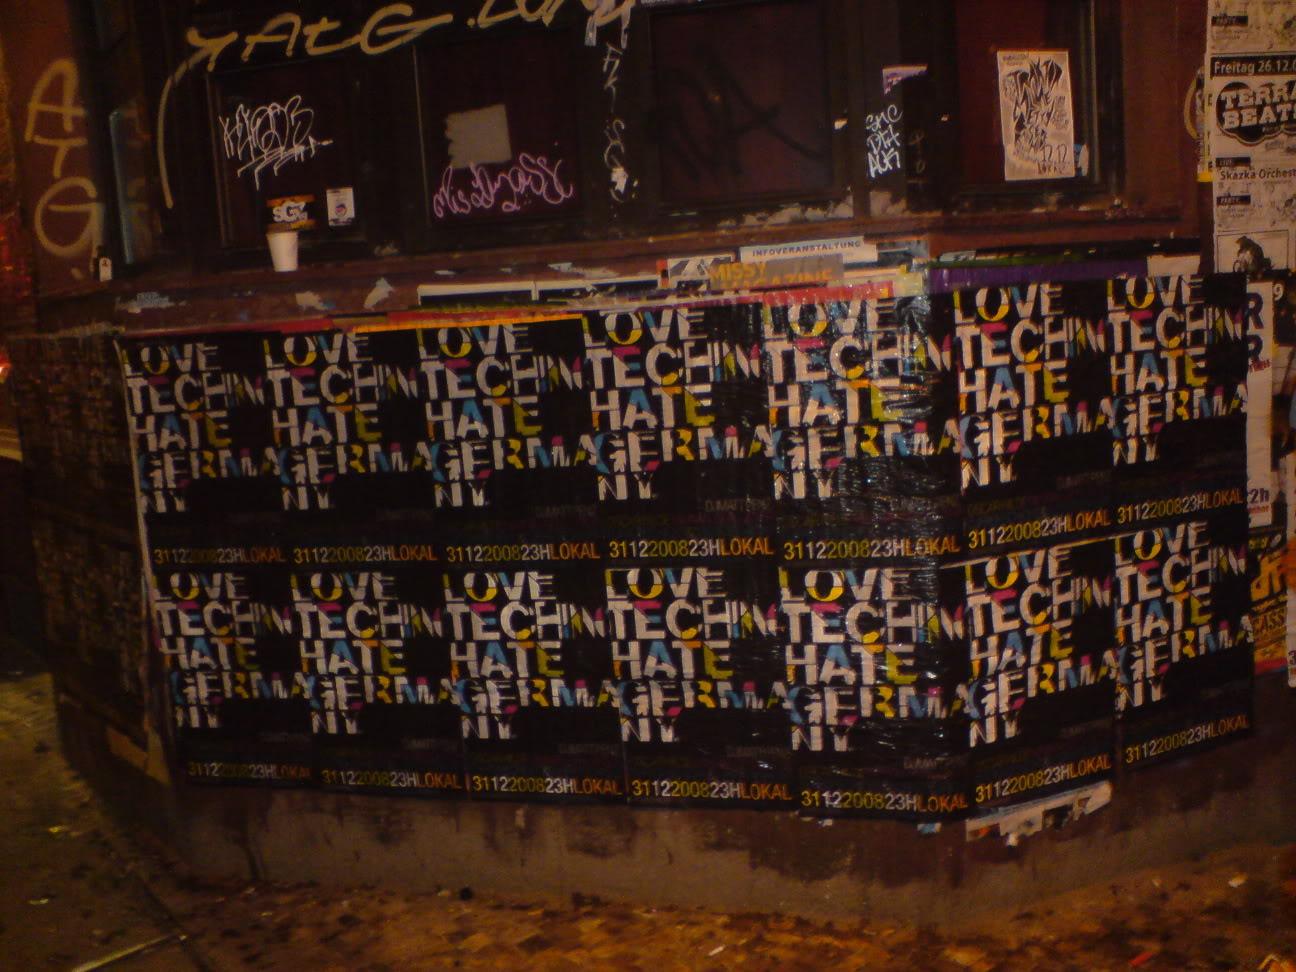 love techno - hate germany plakatwand 2008